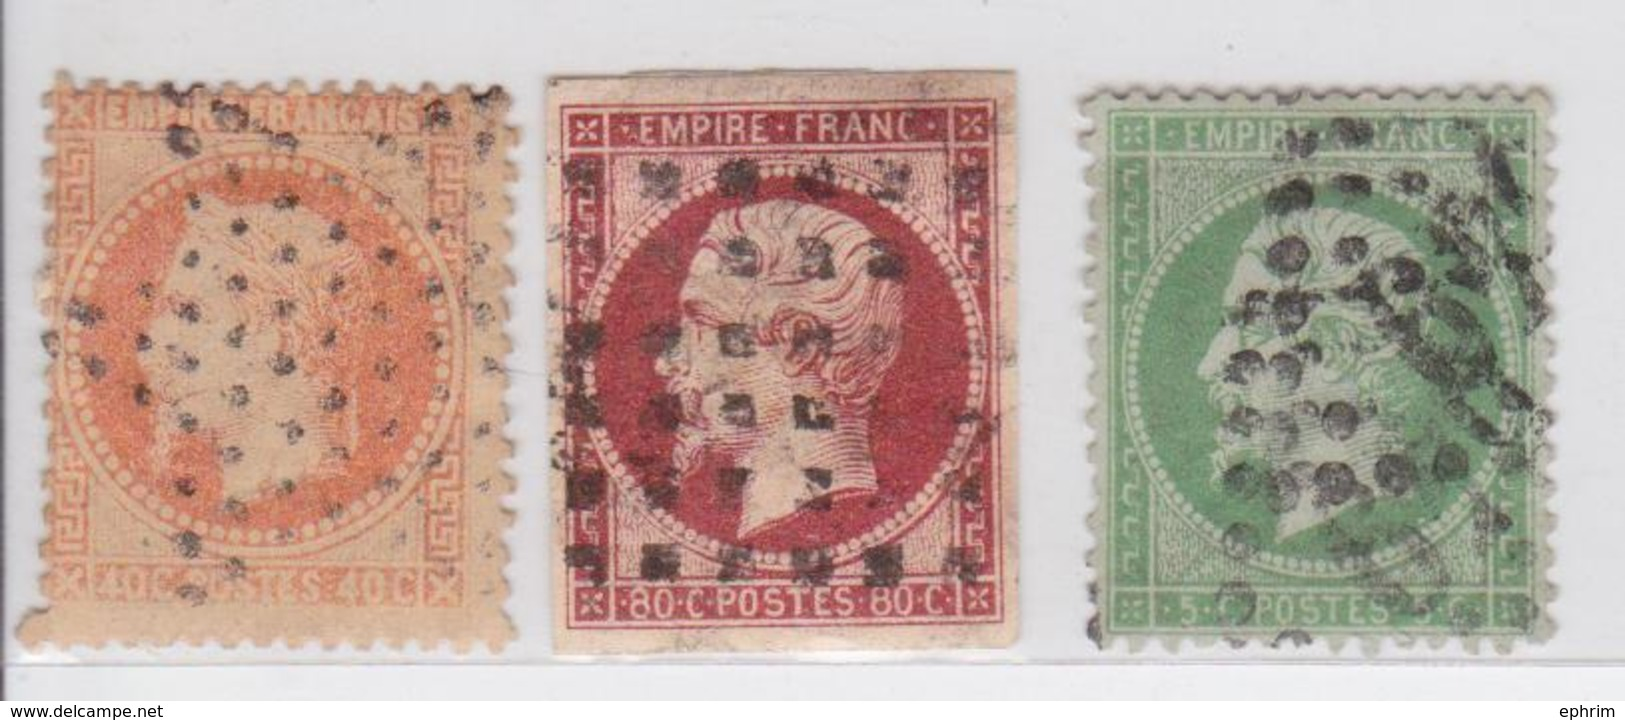 Timbre Napoléon III Lot De 3 Timbres Dont 80 Centimes Rose Avec Beau Quadrillage - 1862 Napoleon III